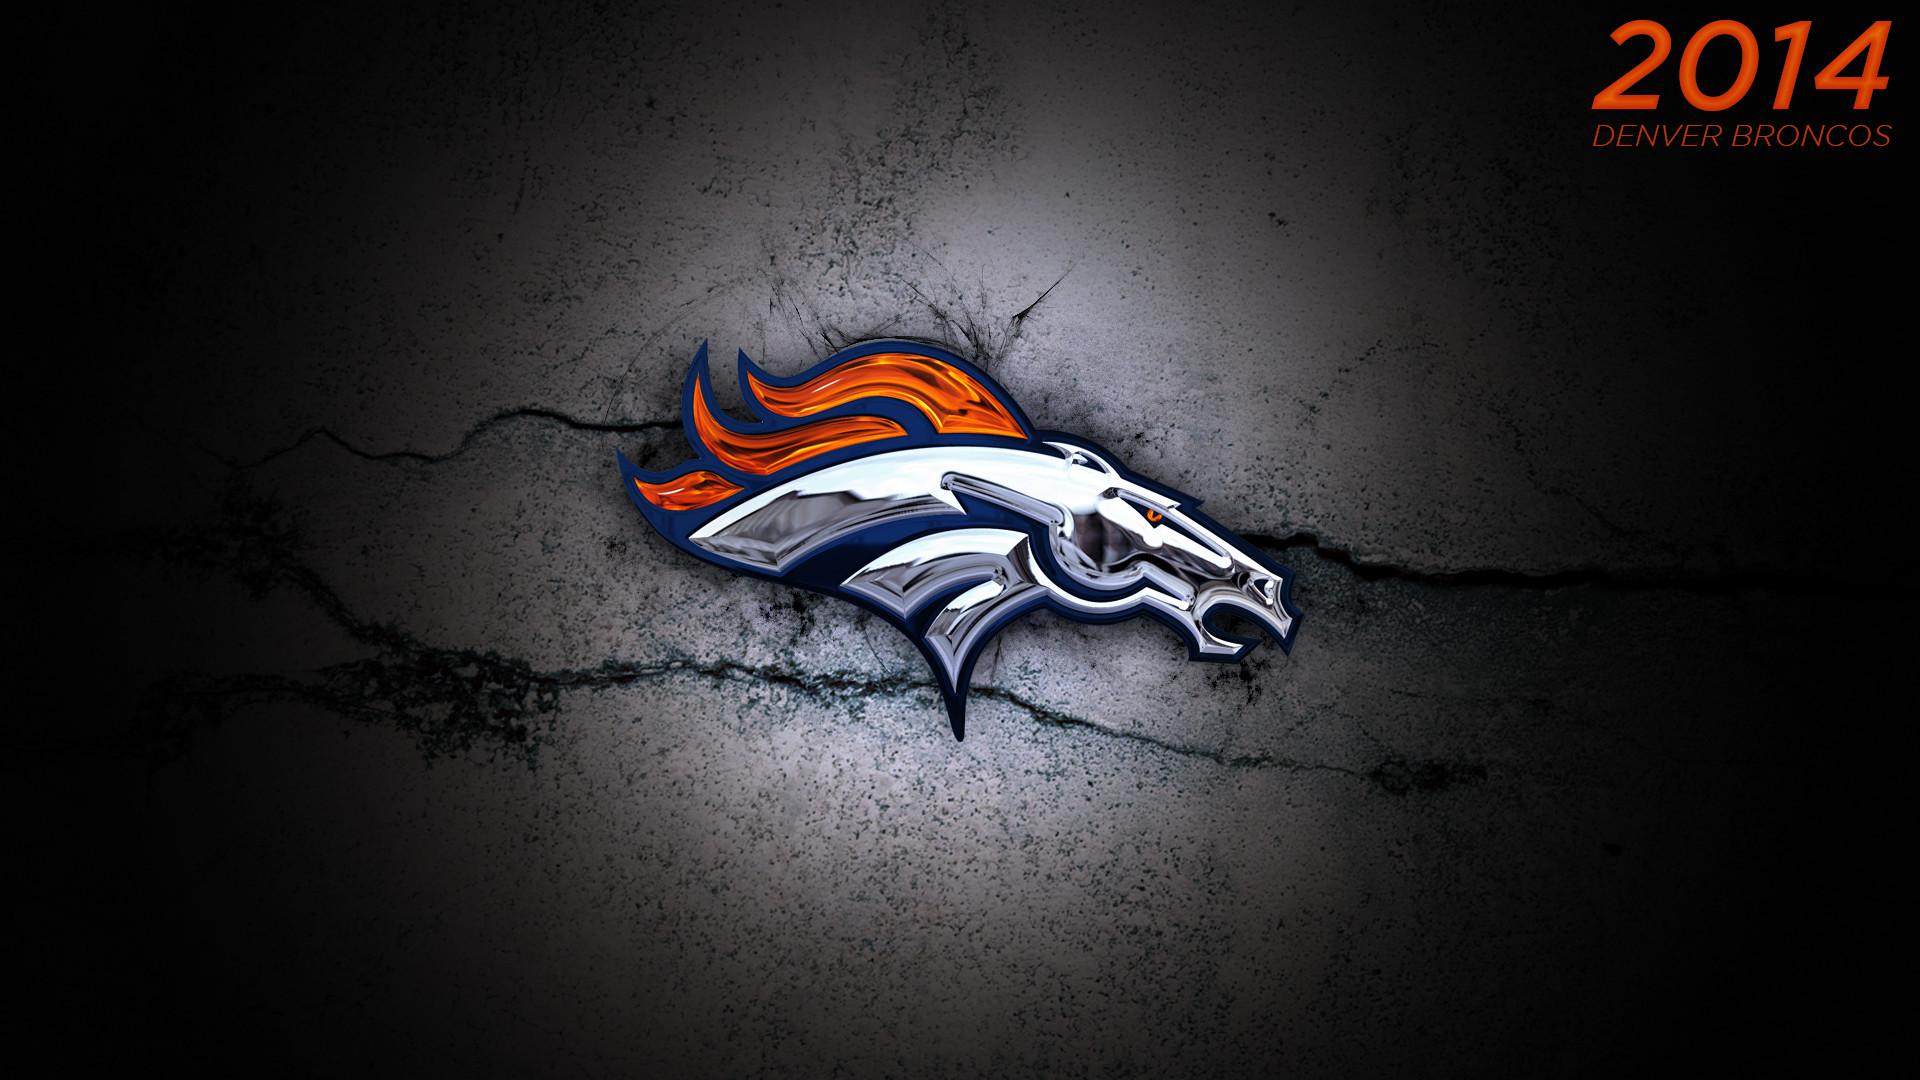 Broncos Wallpaper. 1920×1080